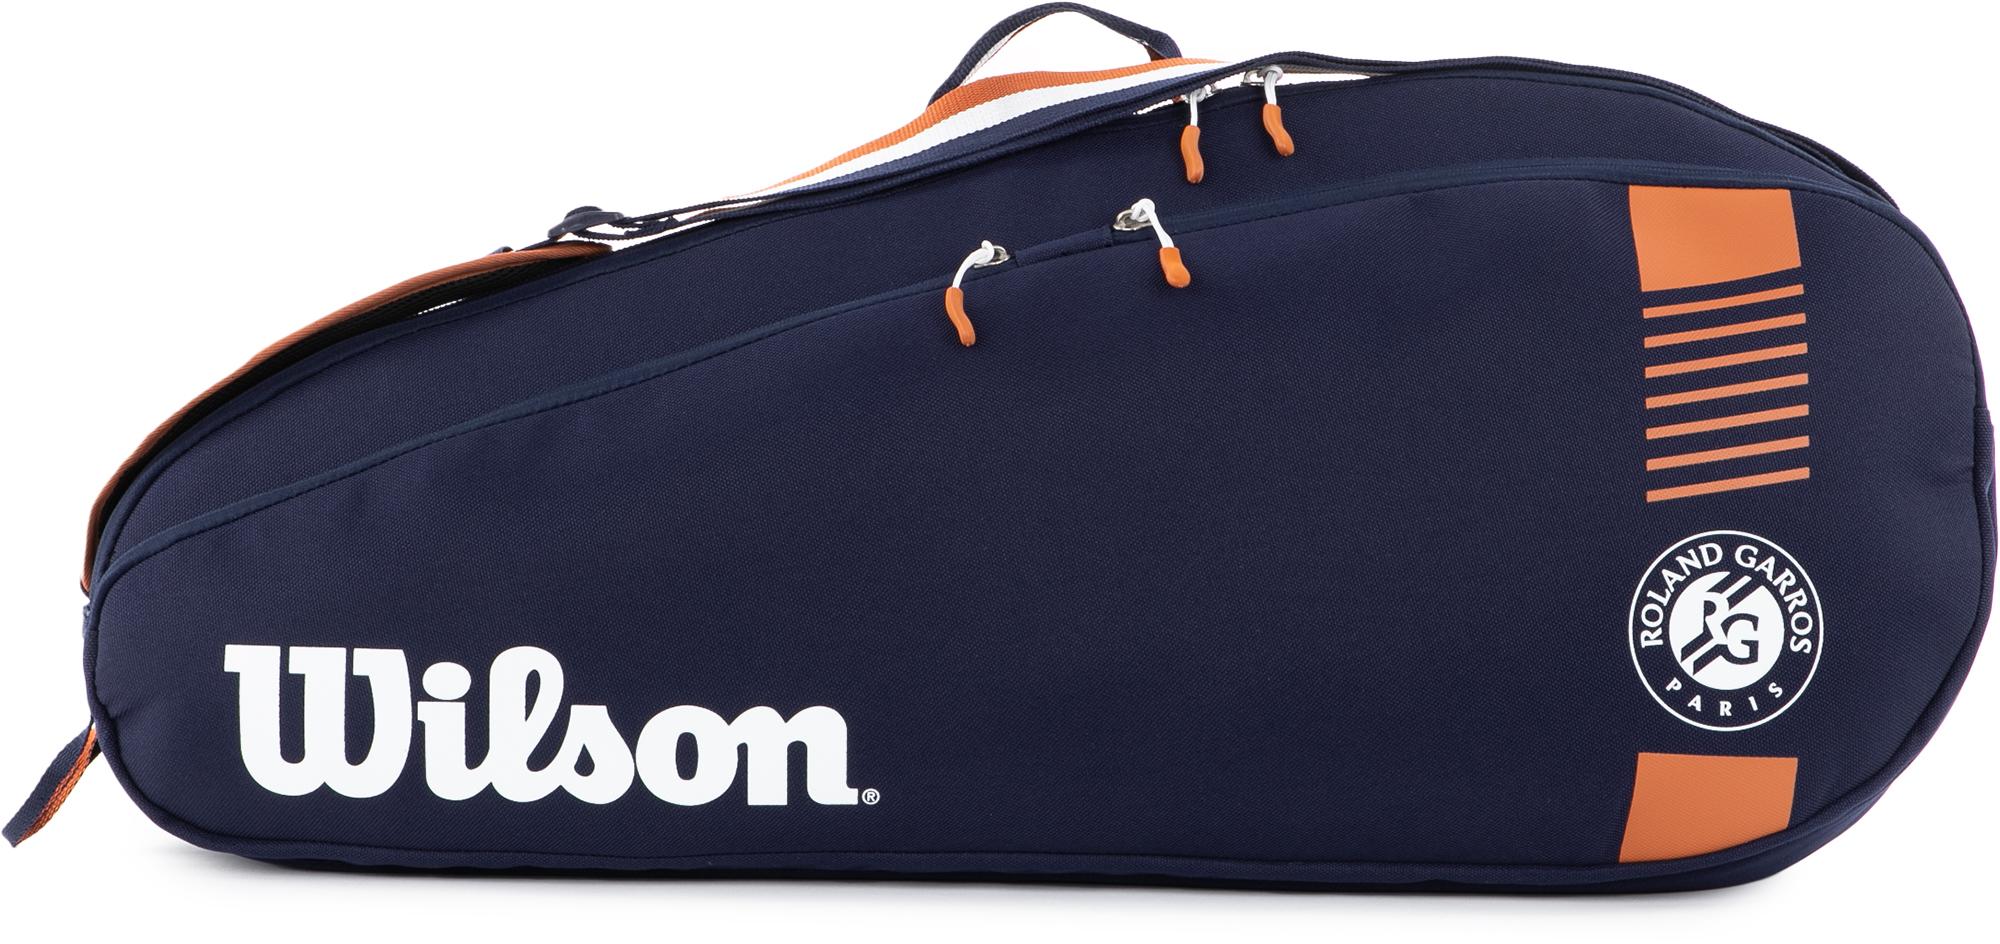 Wilson Сумка для 3 ракеток Wilson Fed Team 3 Pack сумка suncarry 3